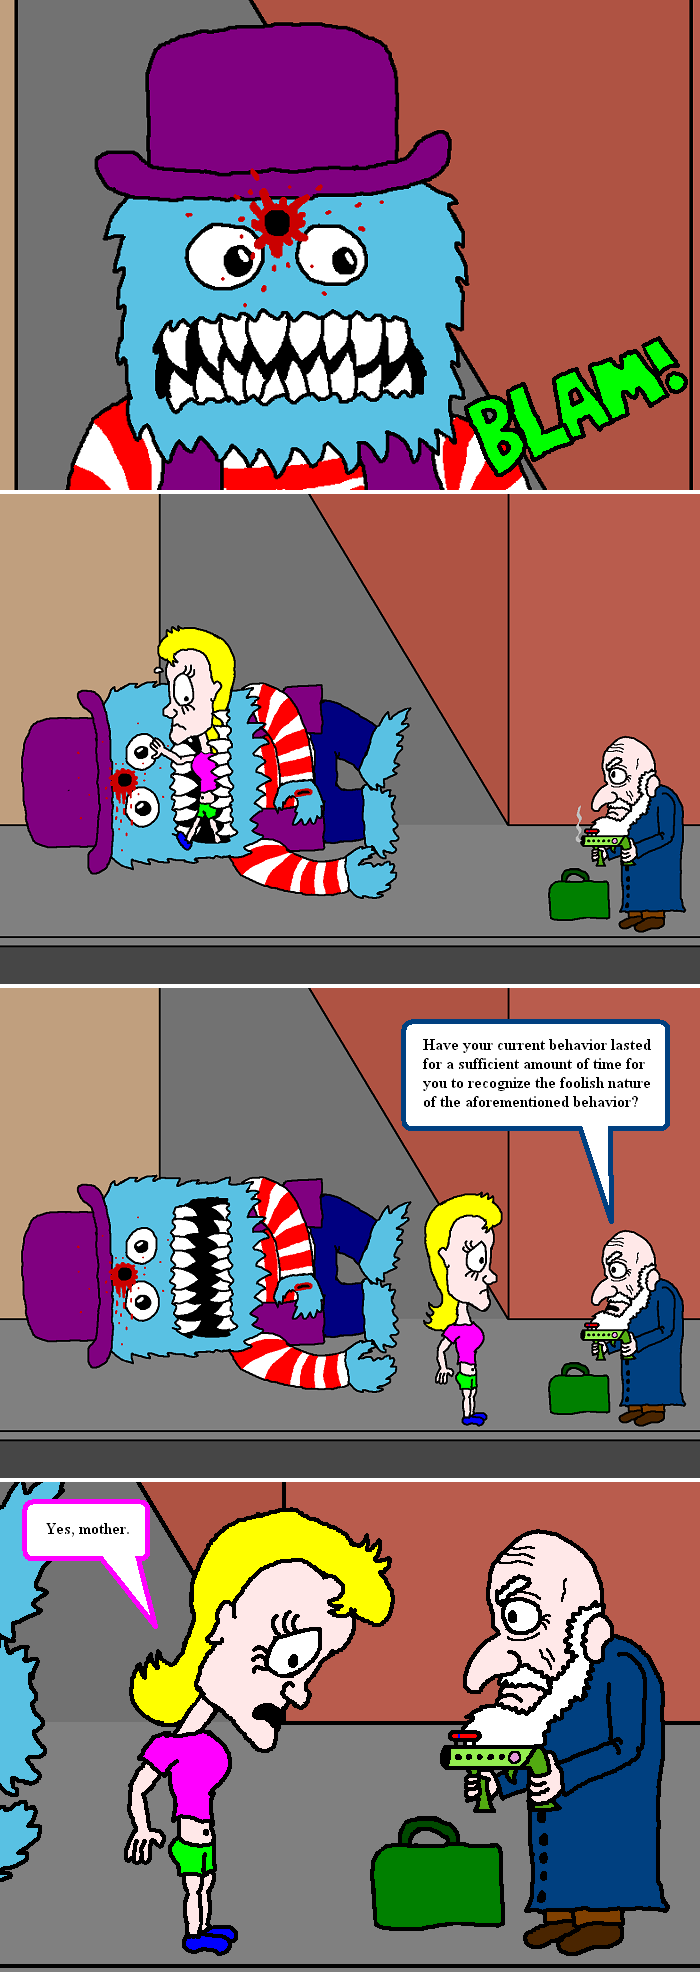 The ninth last strip